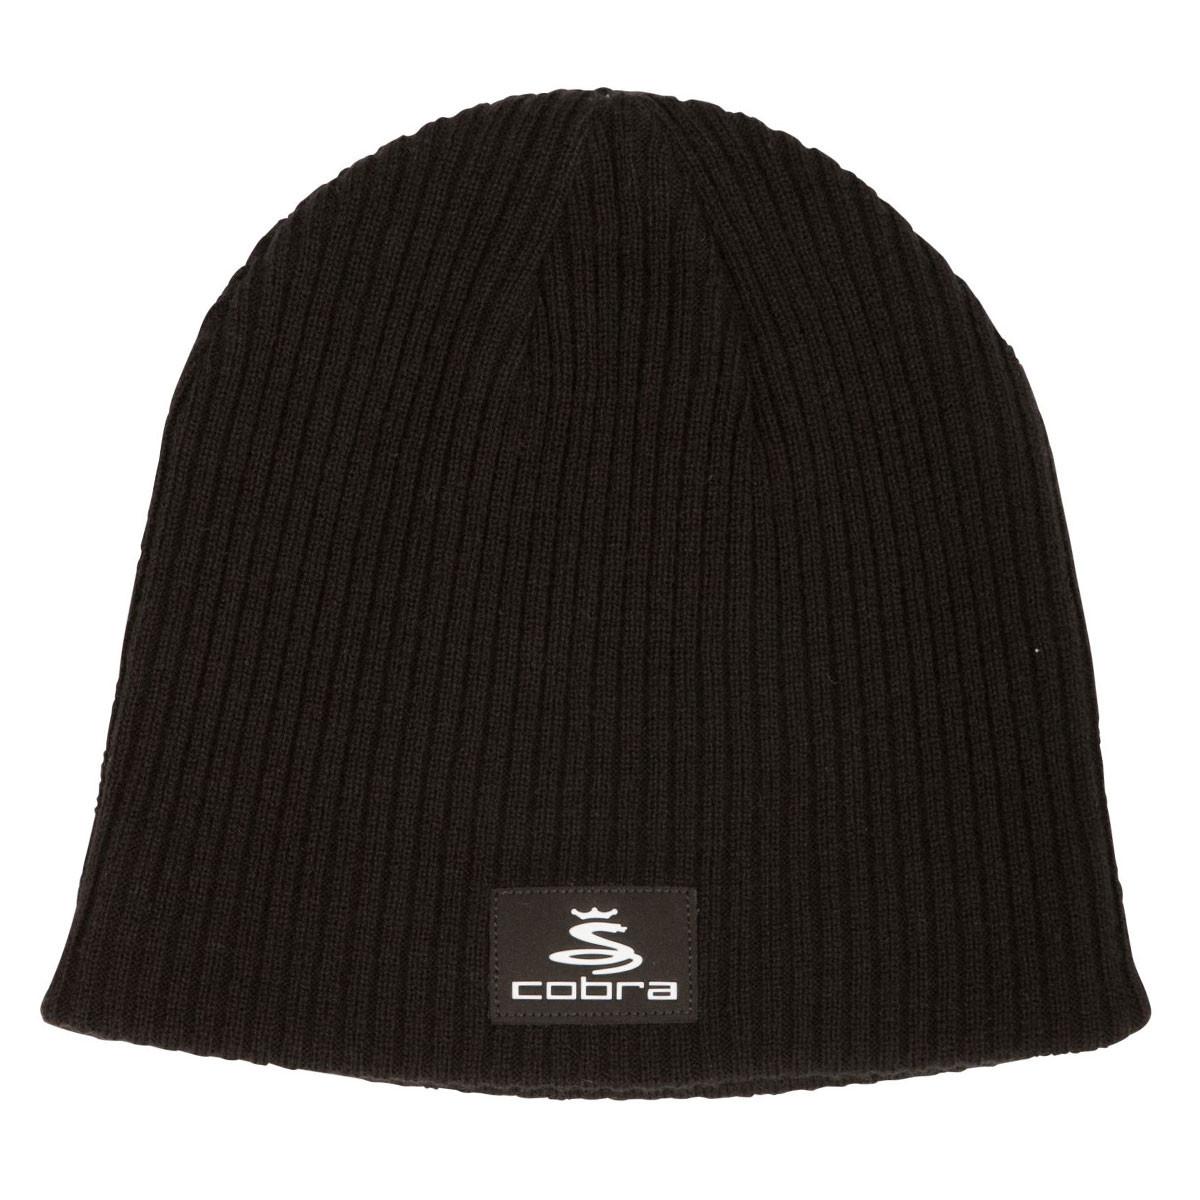 edd18951894 Cobra Golf Mens Reversible Knit Beanie Hat - Cobra - A-Z of Brands ...